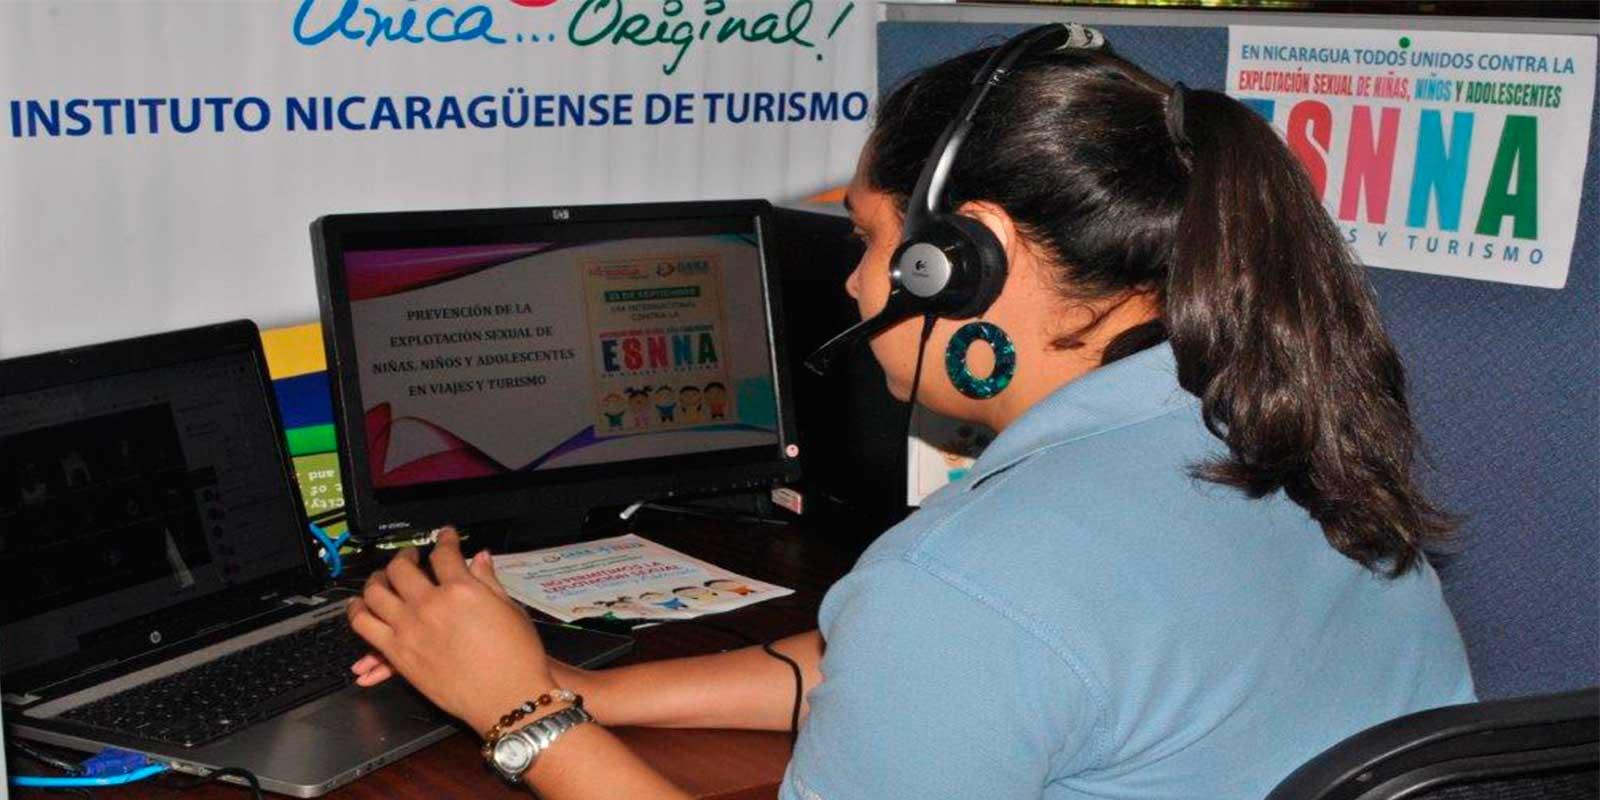 Esnna-Talleres-contra-la-explotación-infantil---Nicaraga